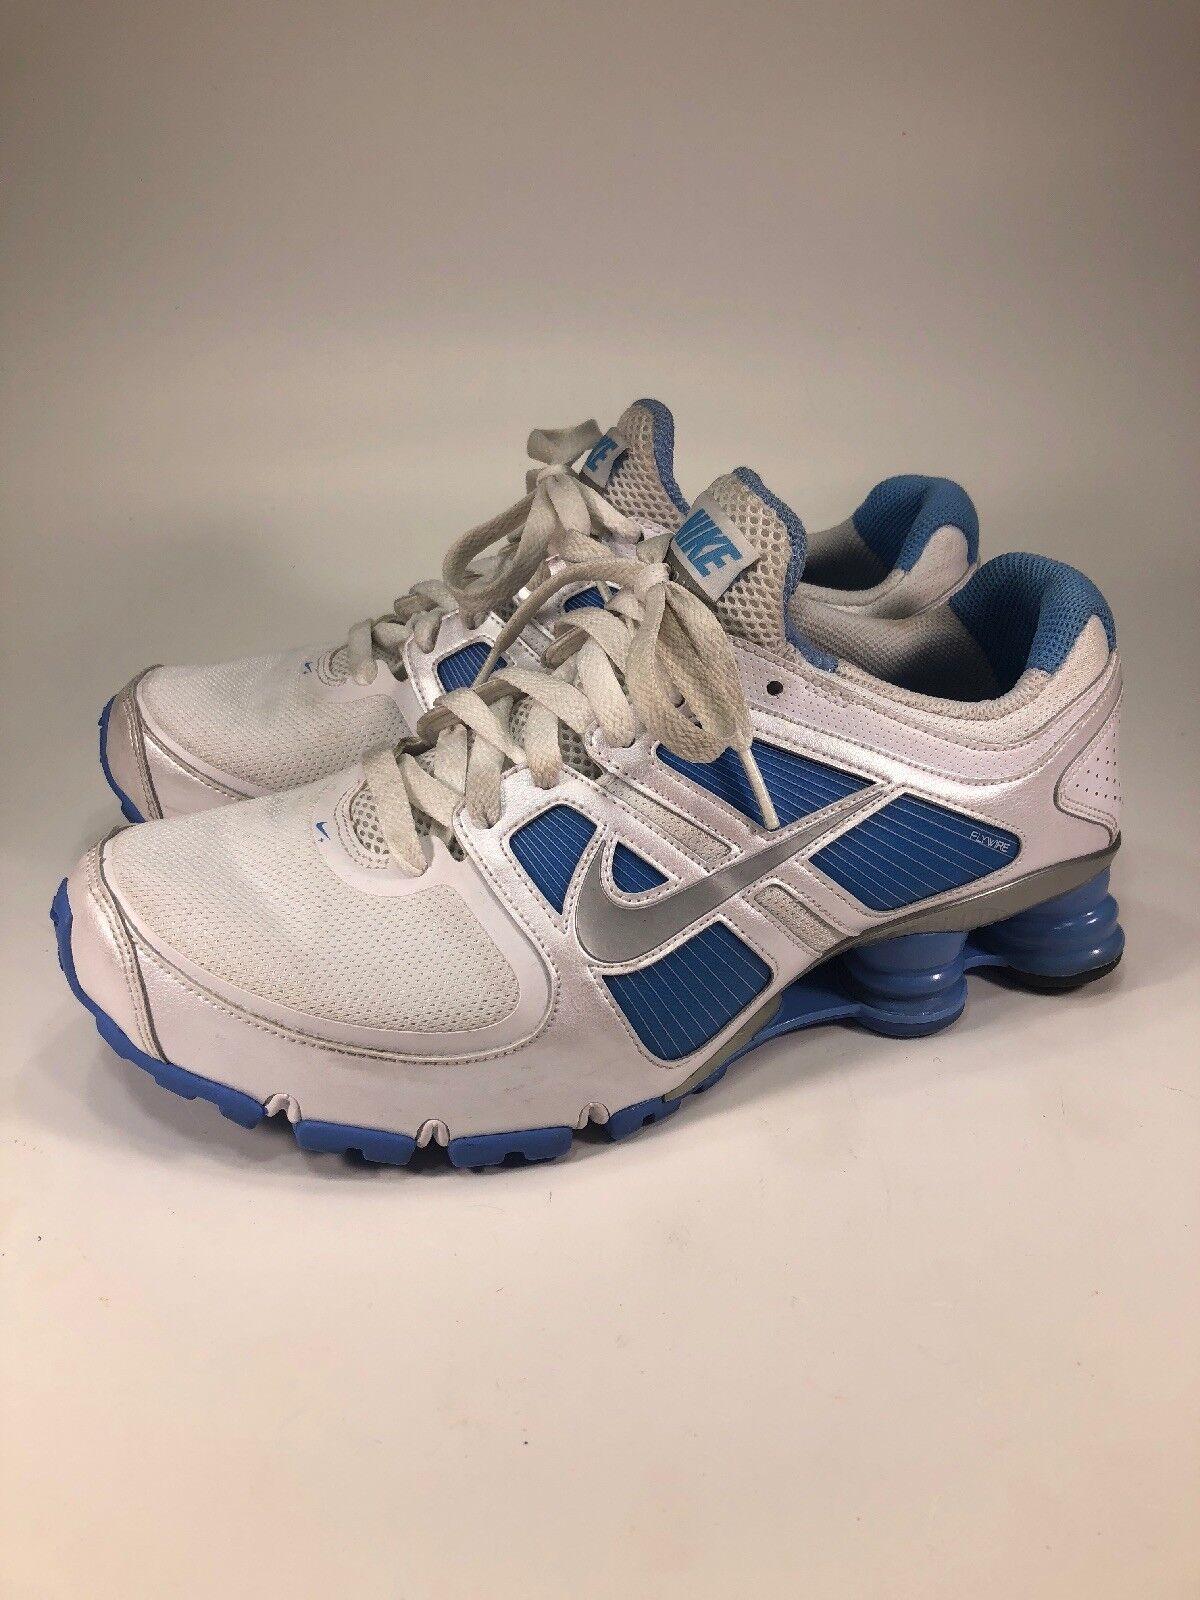 Nike Shox Turbo 11 White/Blue 2010 Running Shoes Womens Size 9.5 M